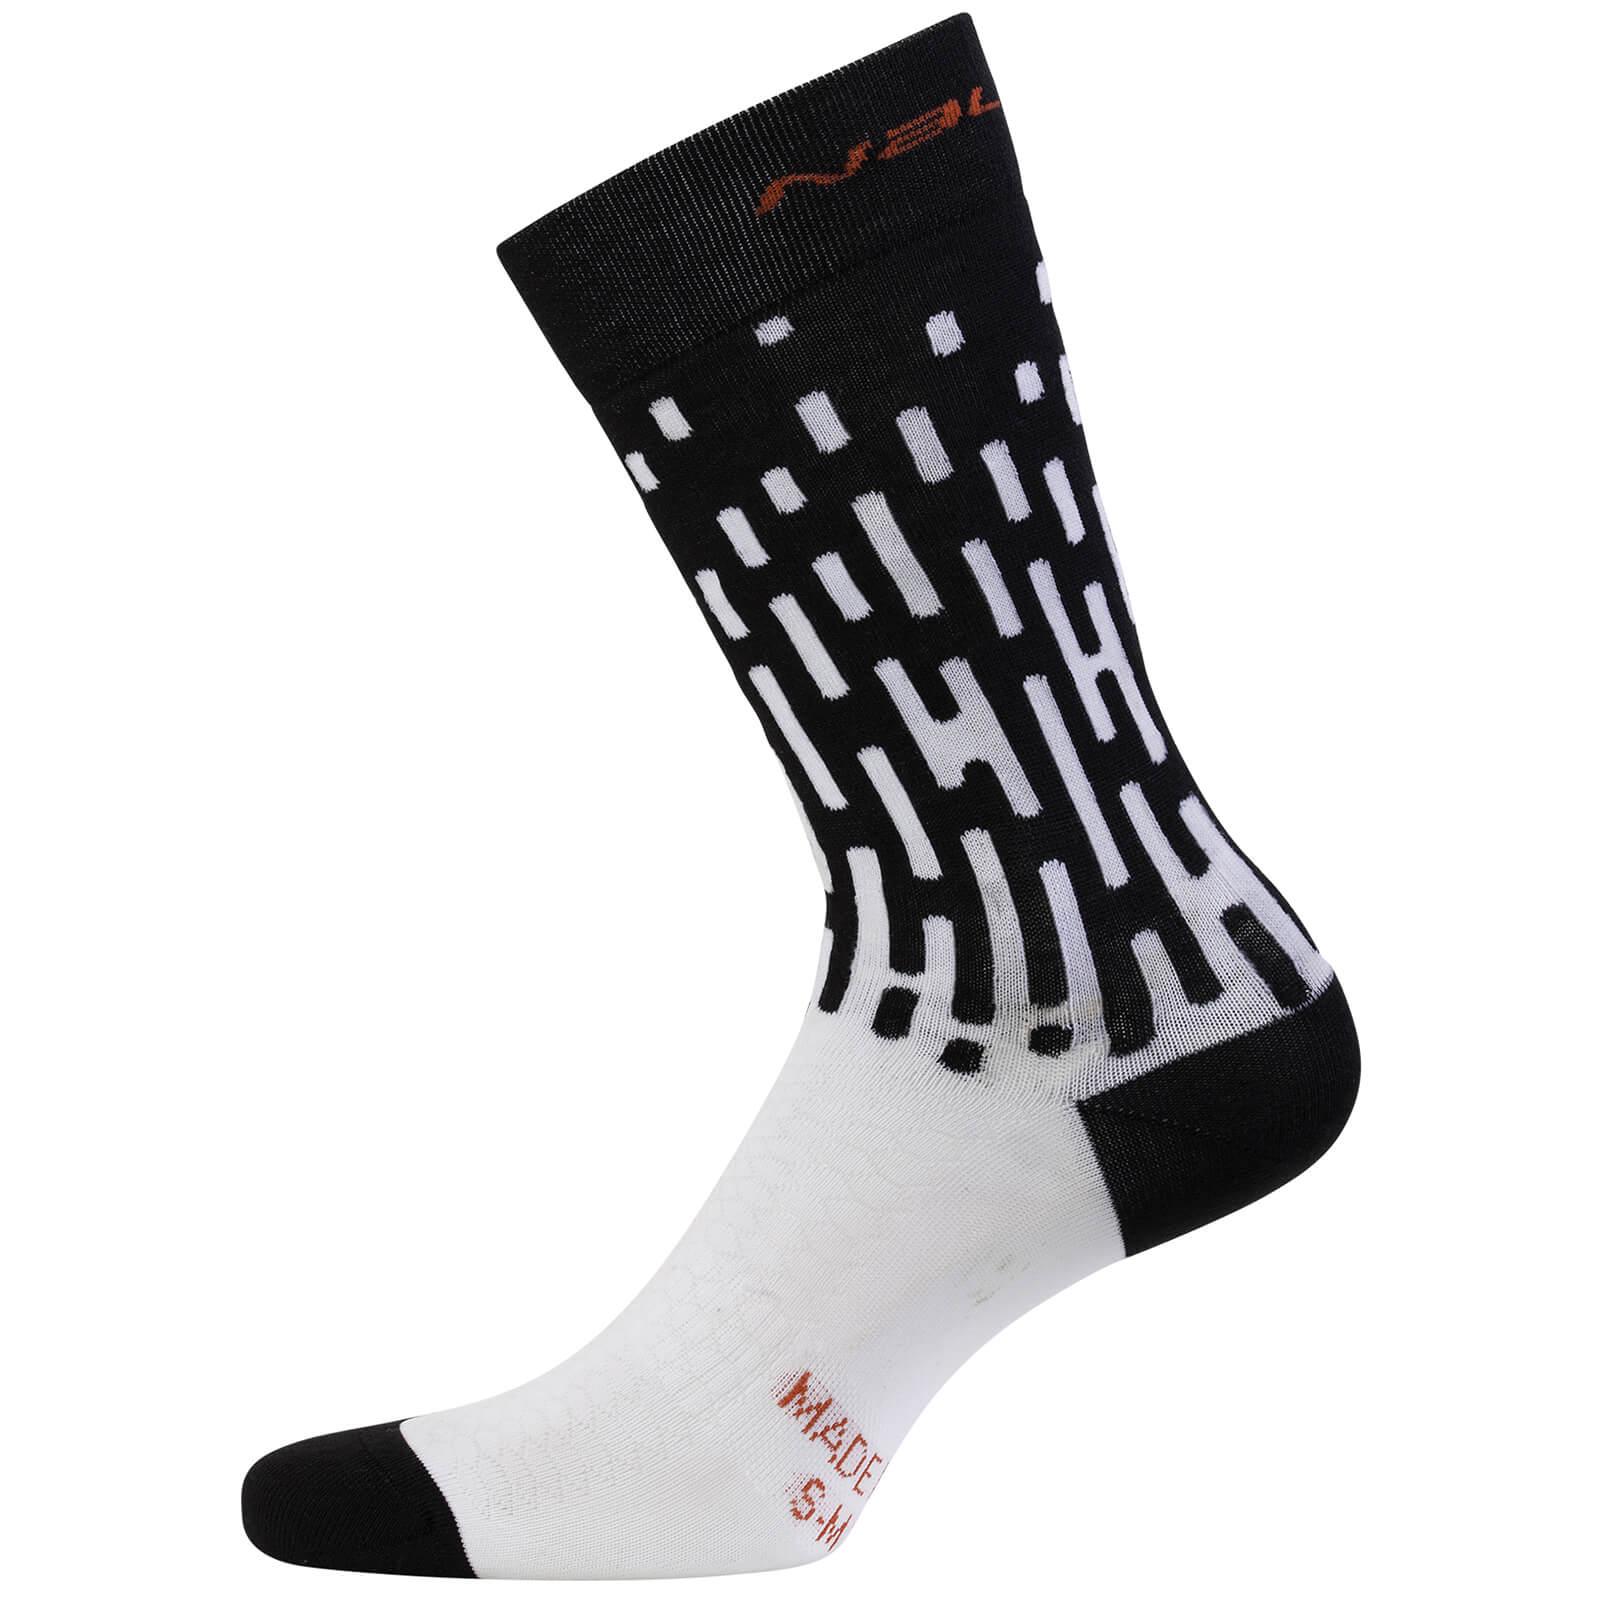 data-product-name | Socks